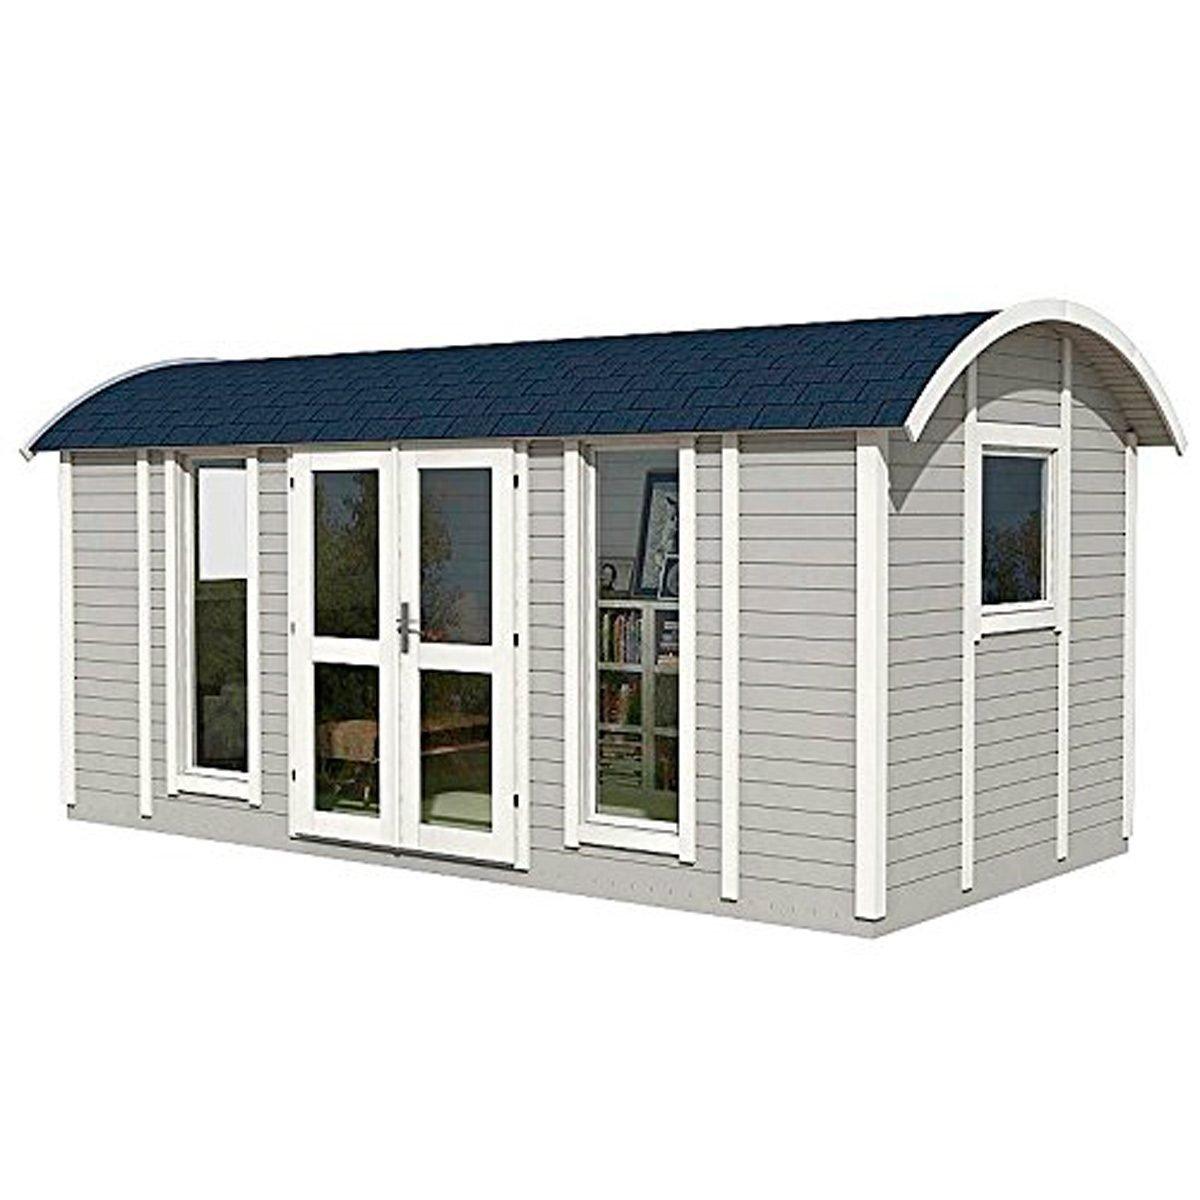 Amazing Cabin Kits You Can Buy On Amazon   Family Handyman